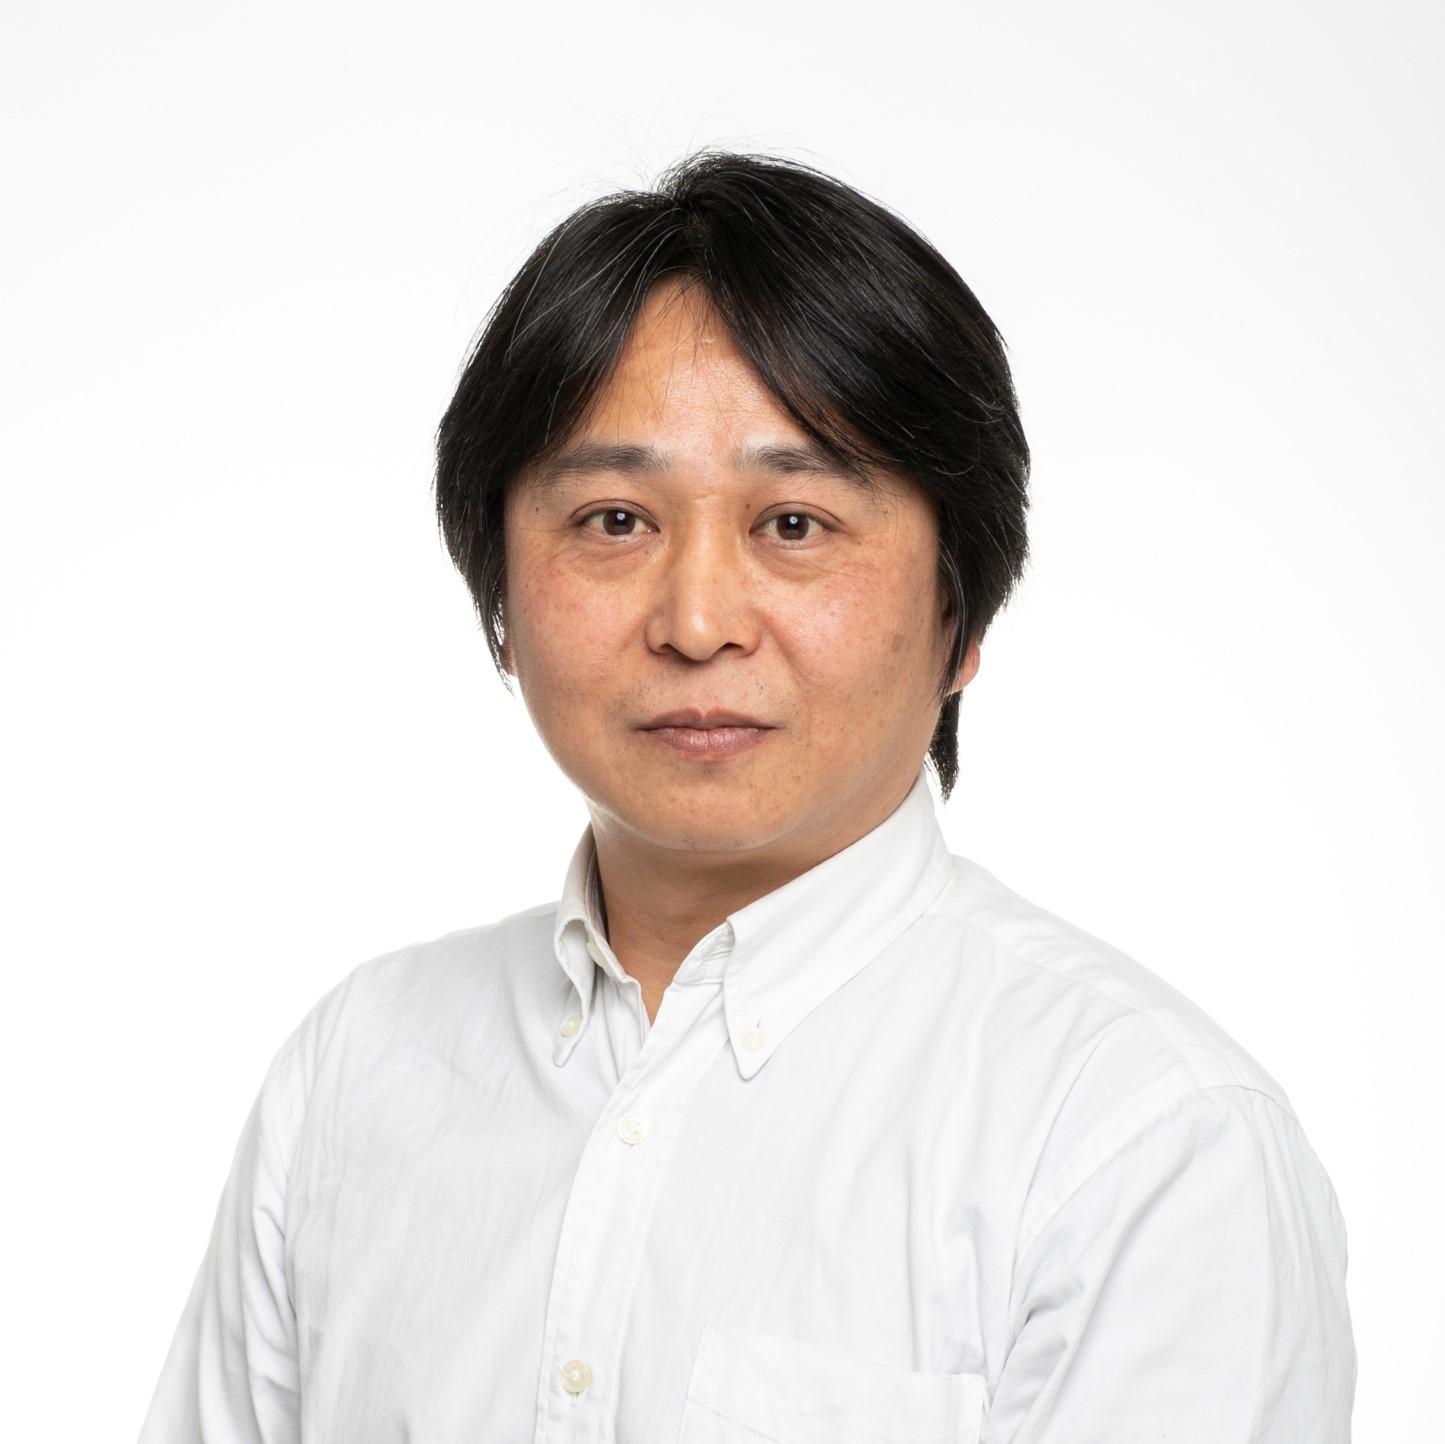 Takaharu Yuki